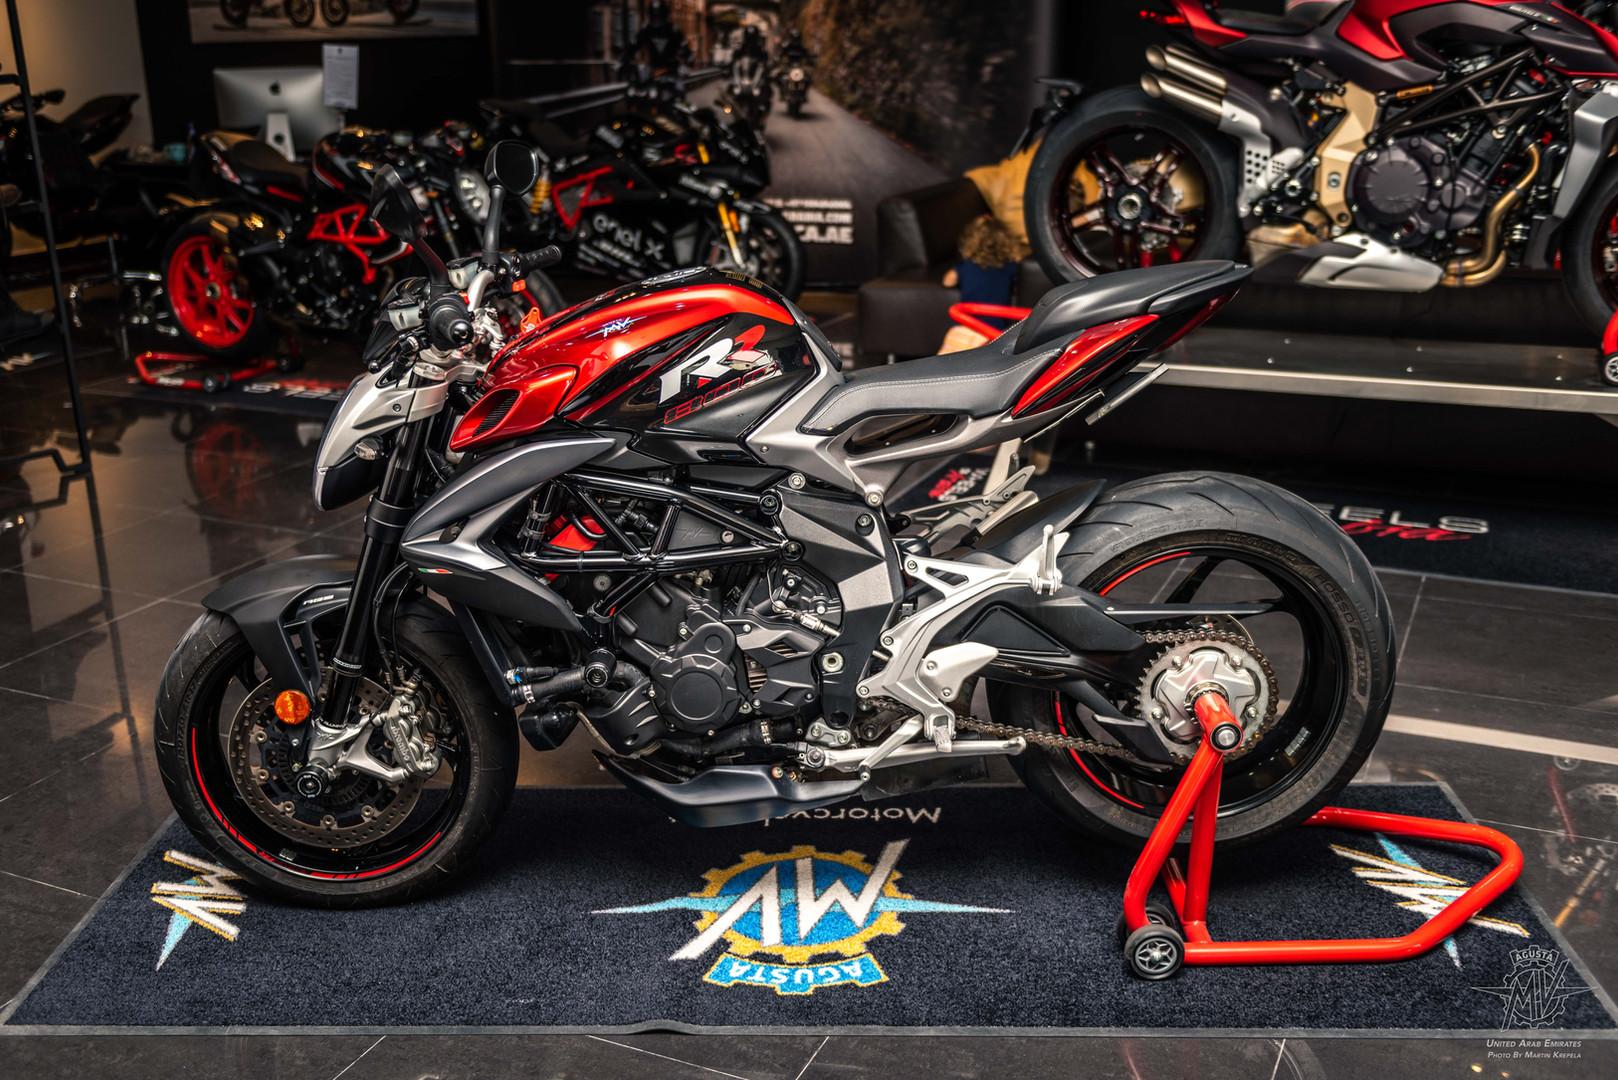 2019 MV Agusta Brutale 800 RR Red/Black